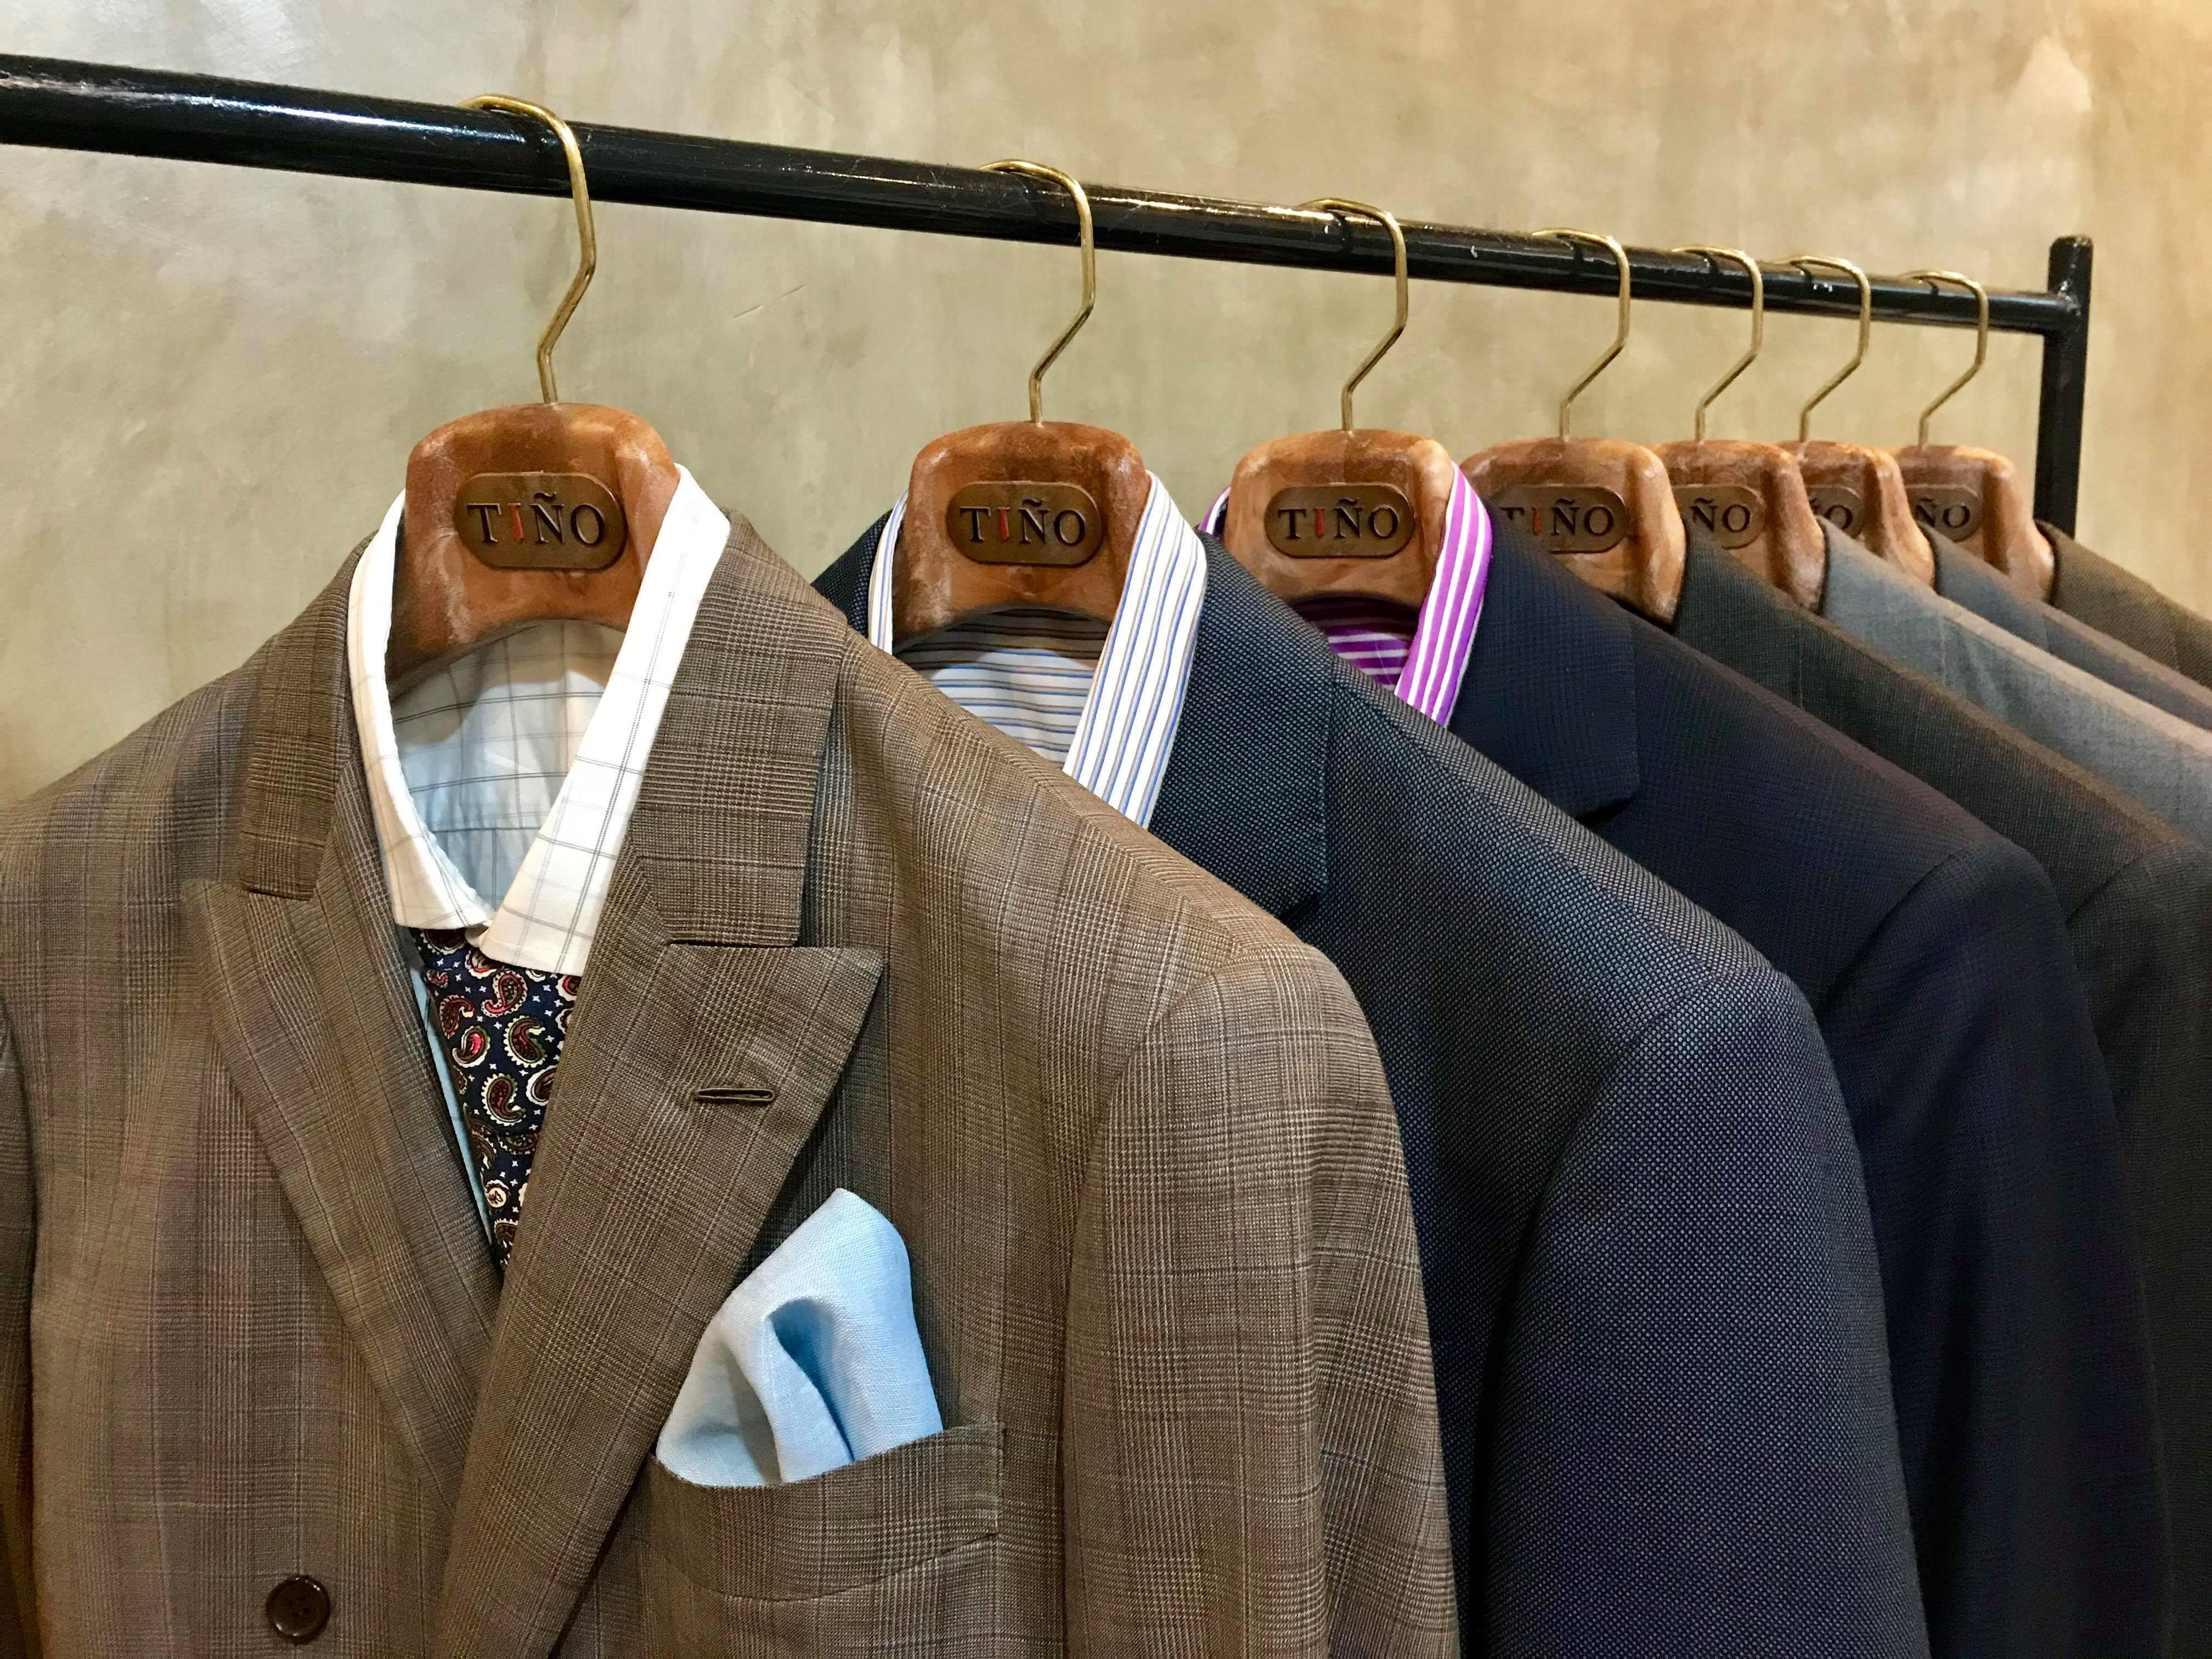 Hanger suits